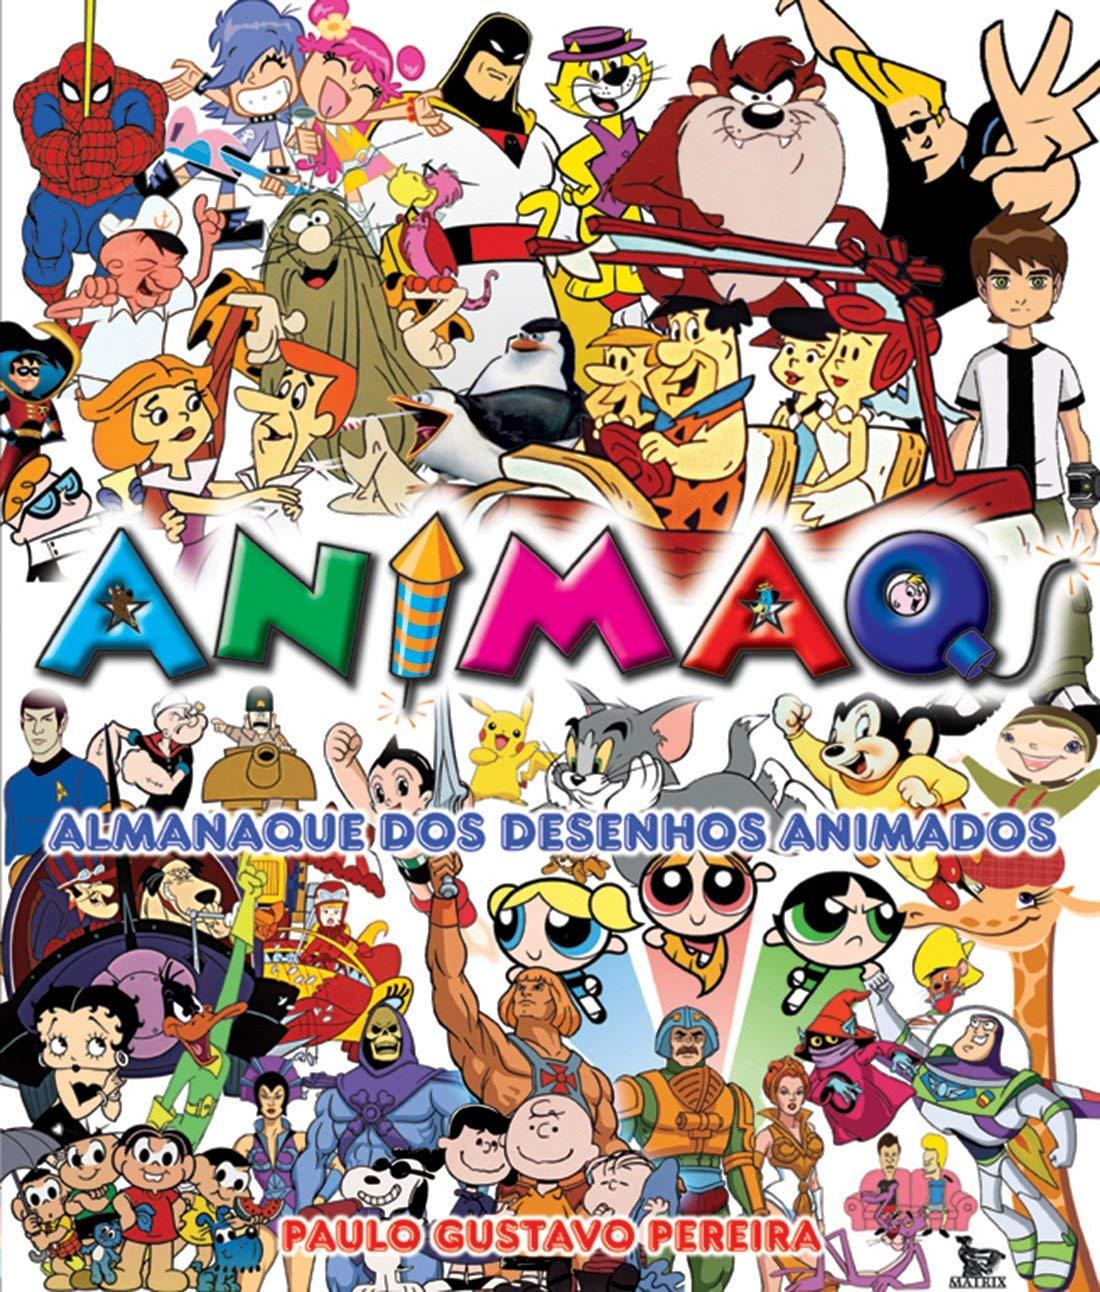 Animaq Almanaque Dos Desenhos Animados Paulo Gustavo Pereira 9788577881468 Amazon Com Books